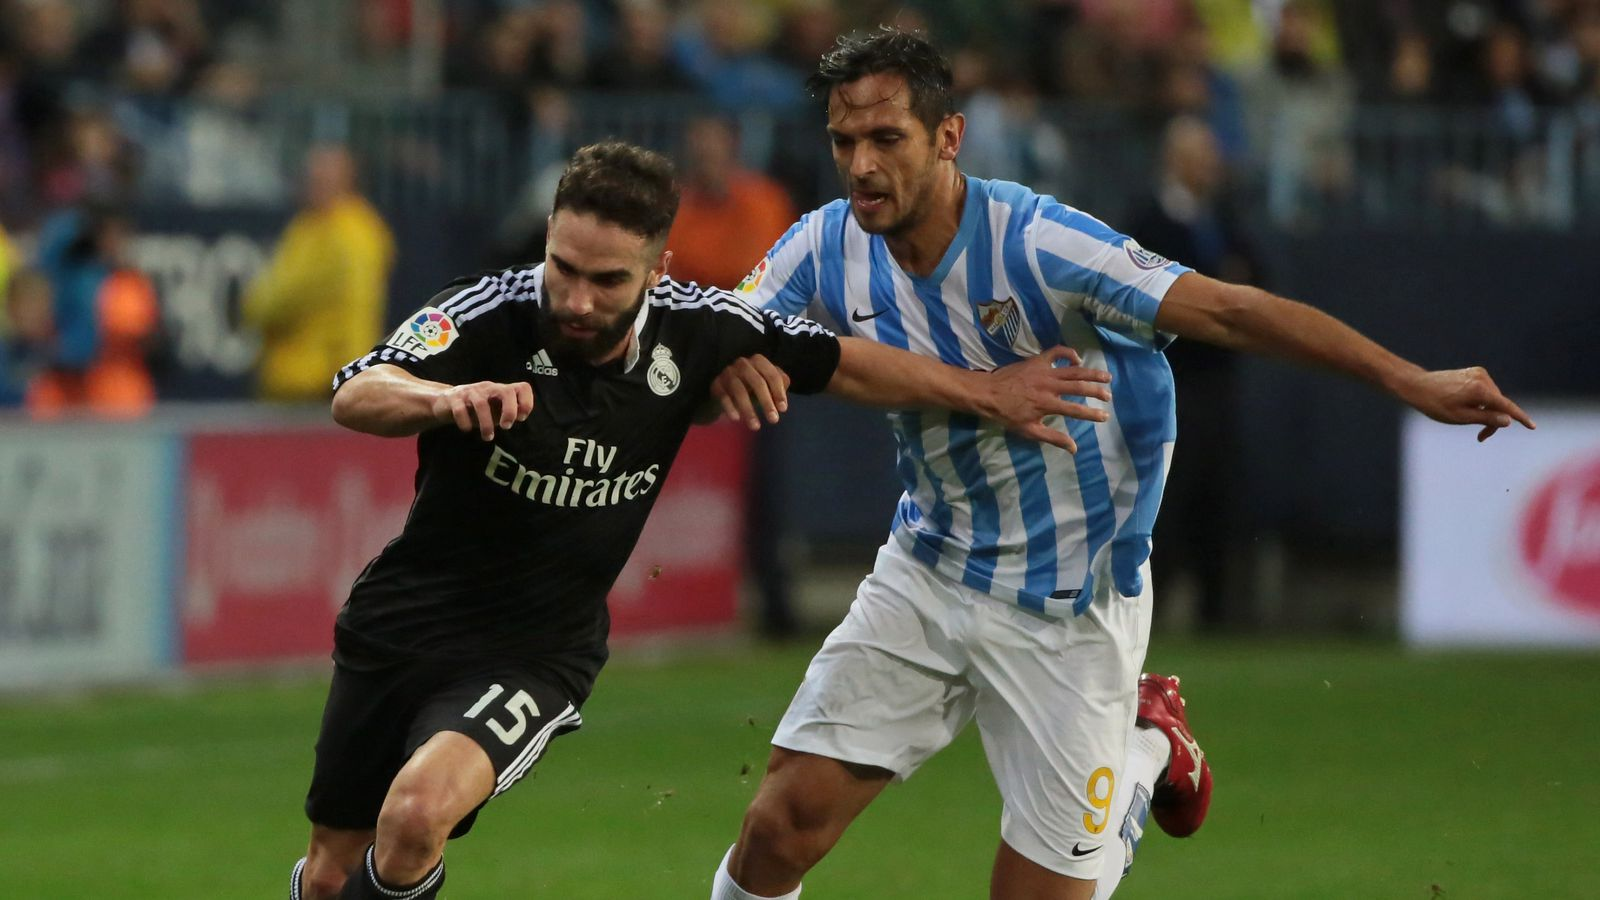 Player Ratings Real Madrid 2: Málaga Vs Real Madrid, Liga BBVA 2014-15: Player Ratings